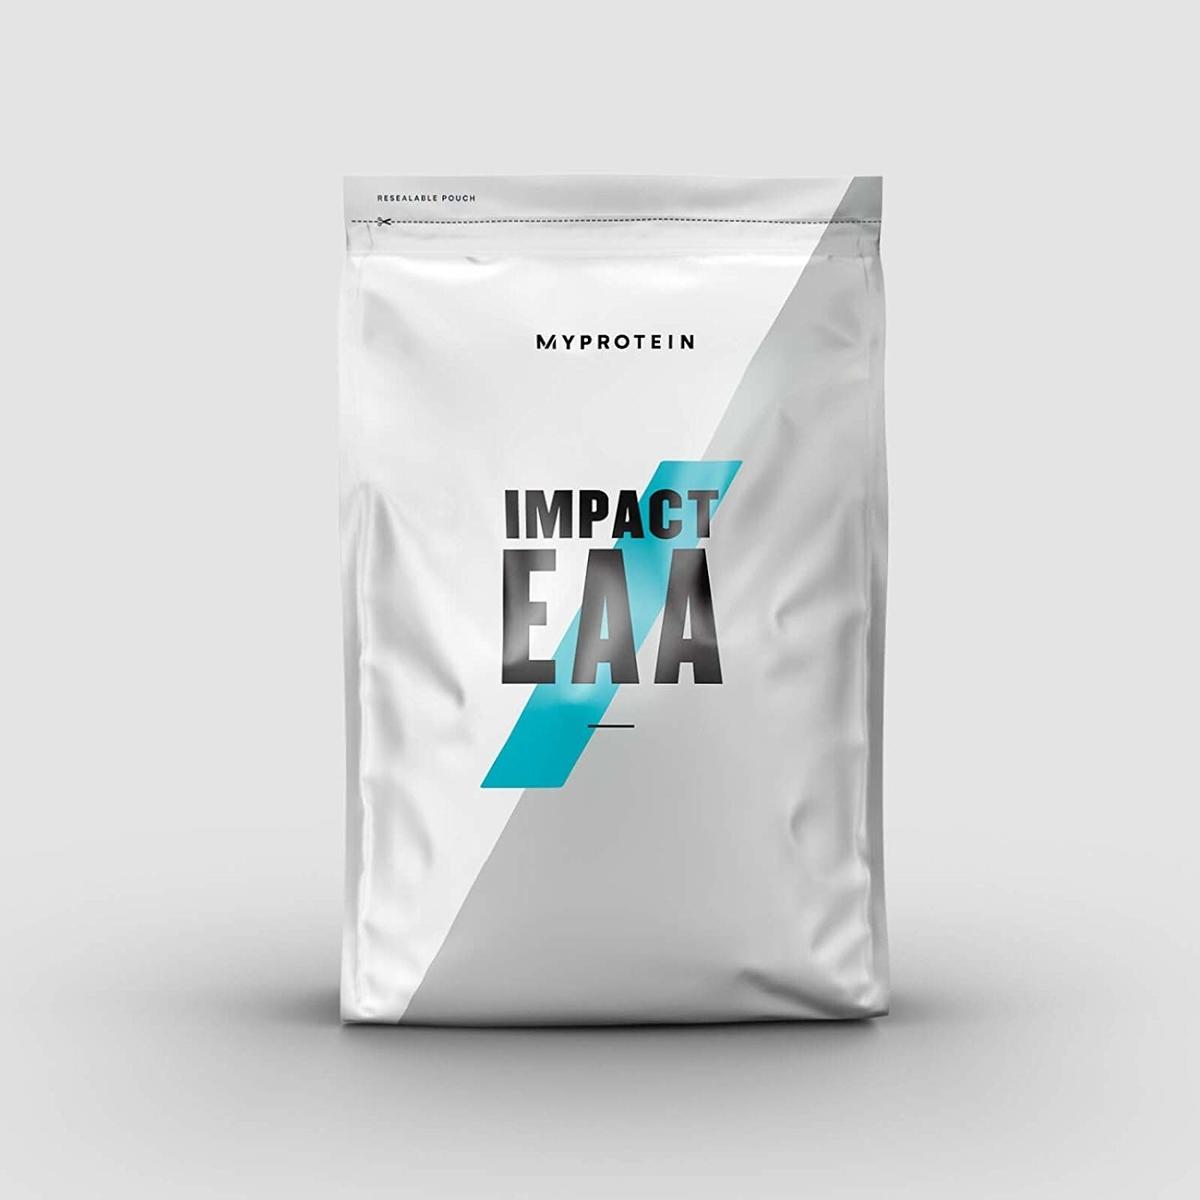 Impact EAA トロピカル味のレビュー!【マイプロテイン】